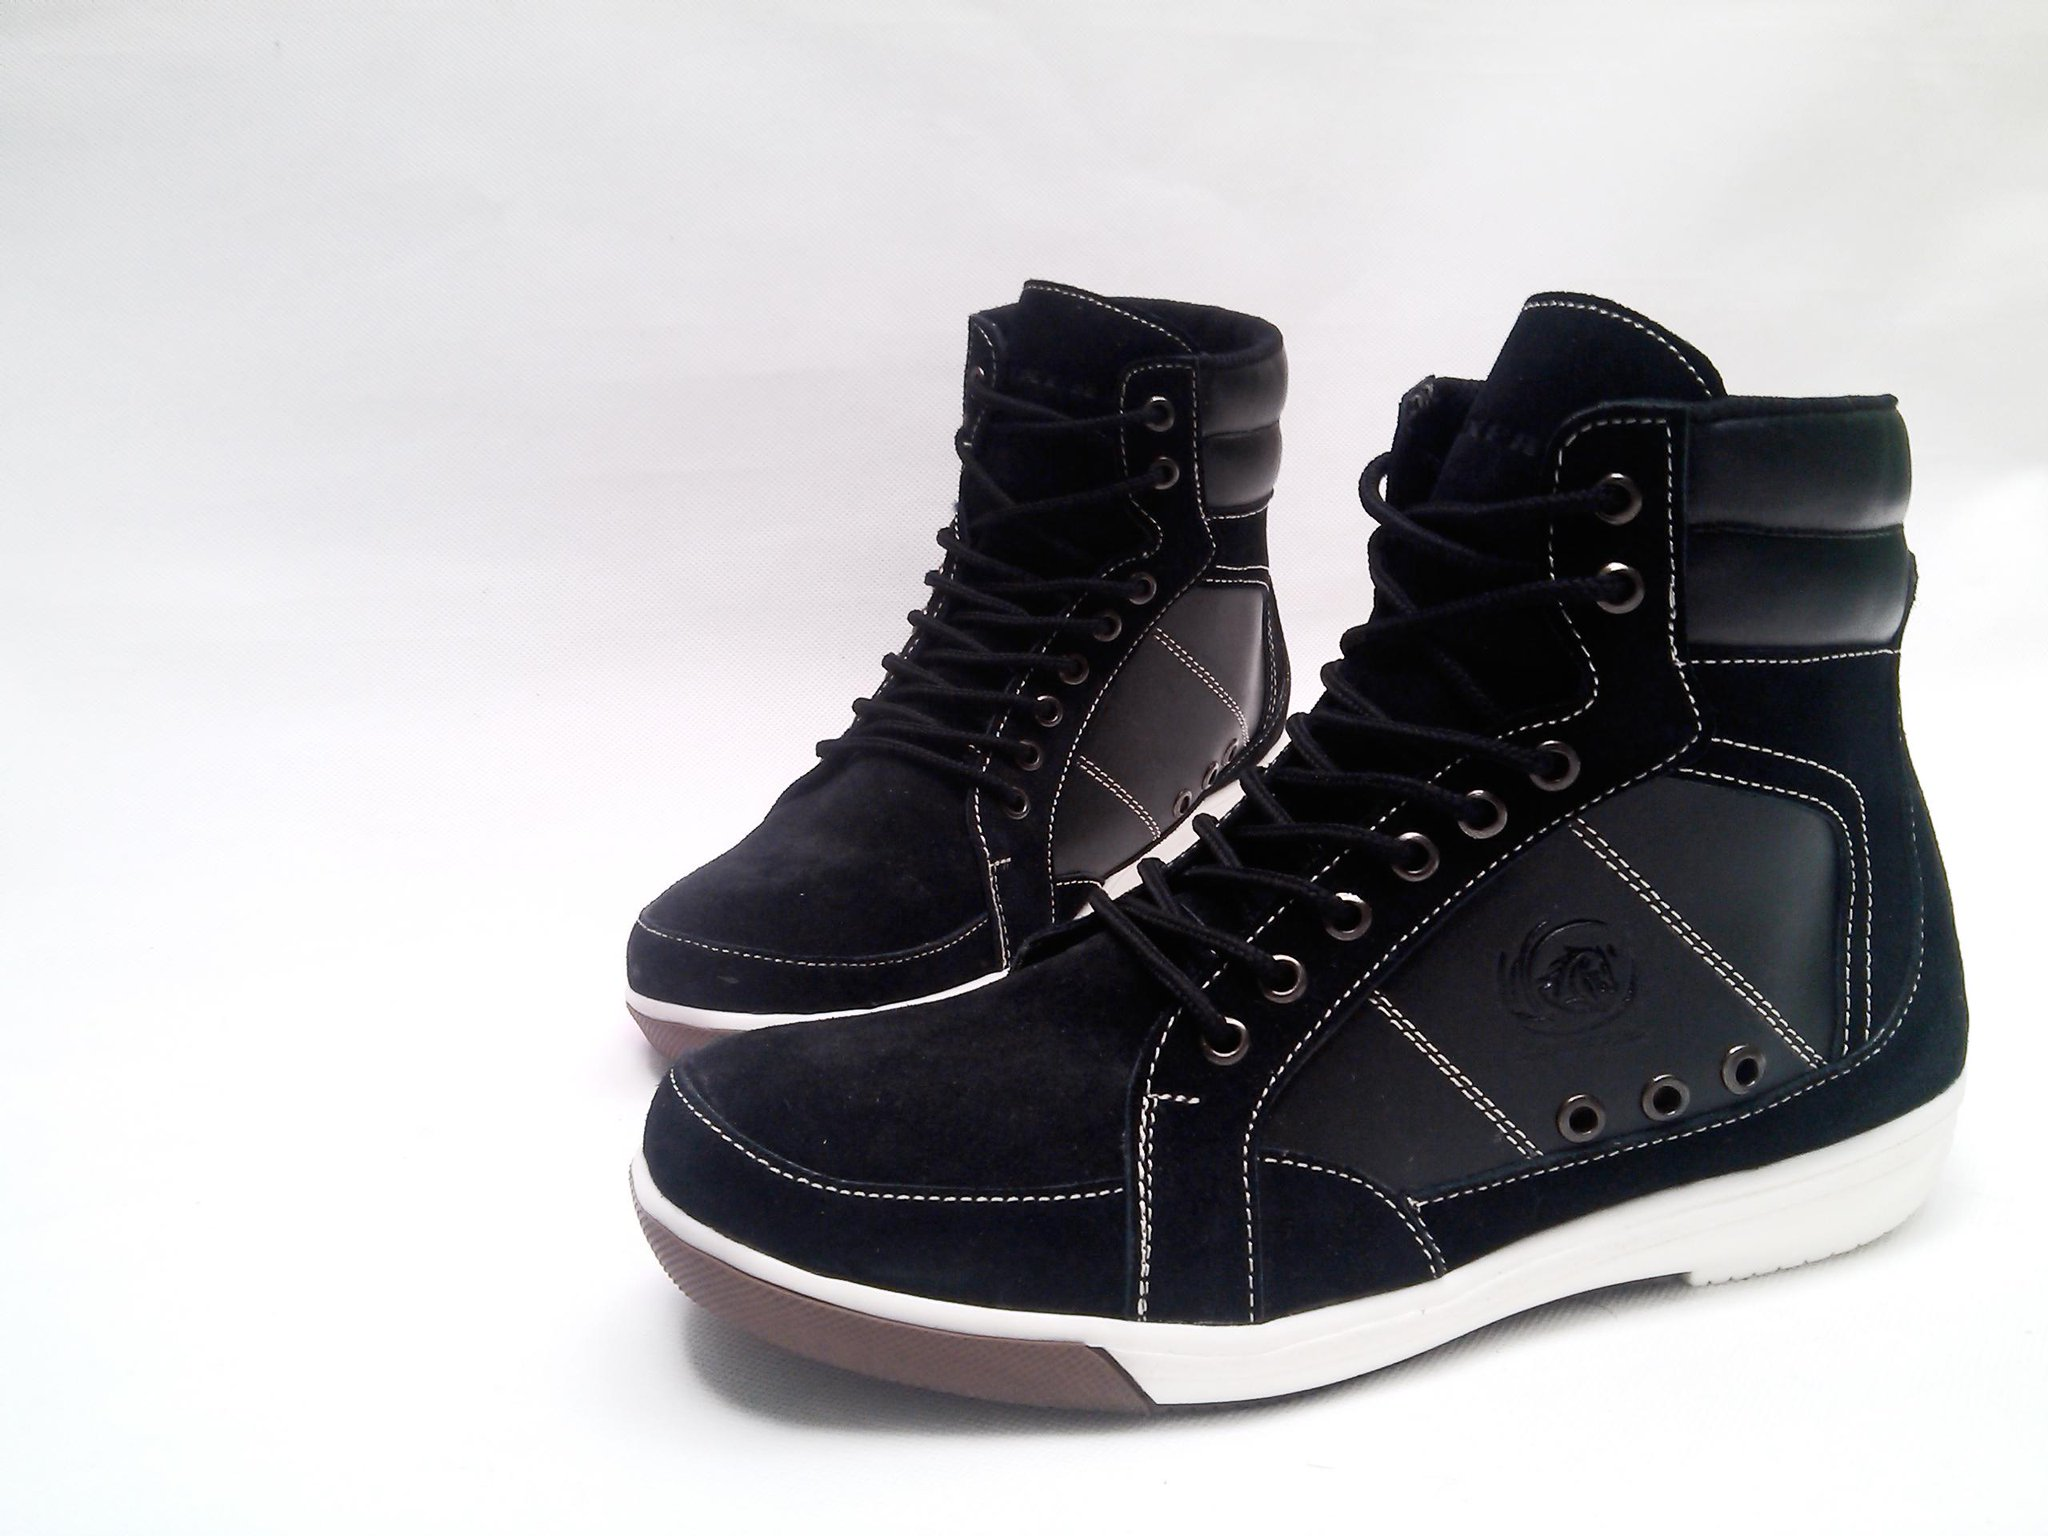 Sepatu sneaker pria bahan kulit Rp 250rb http://t.co/ITxGqtjGfO #sepatupria99